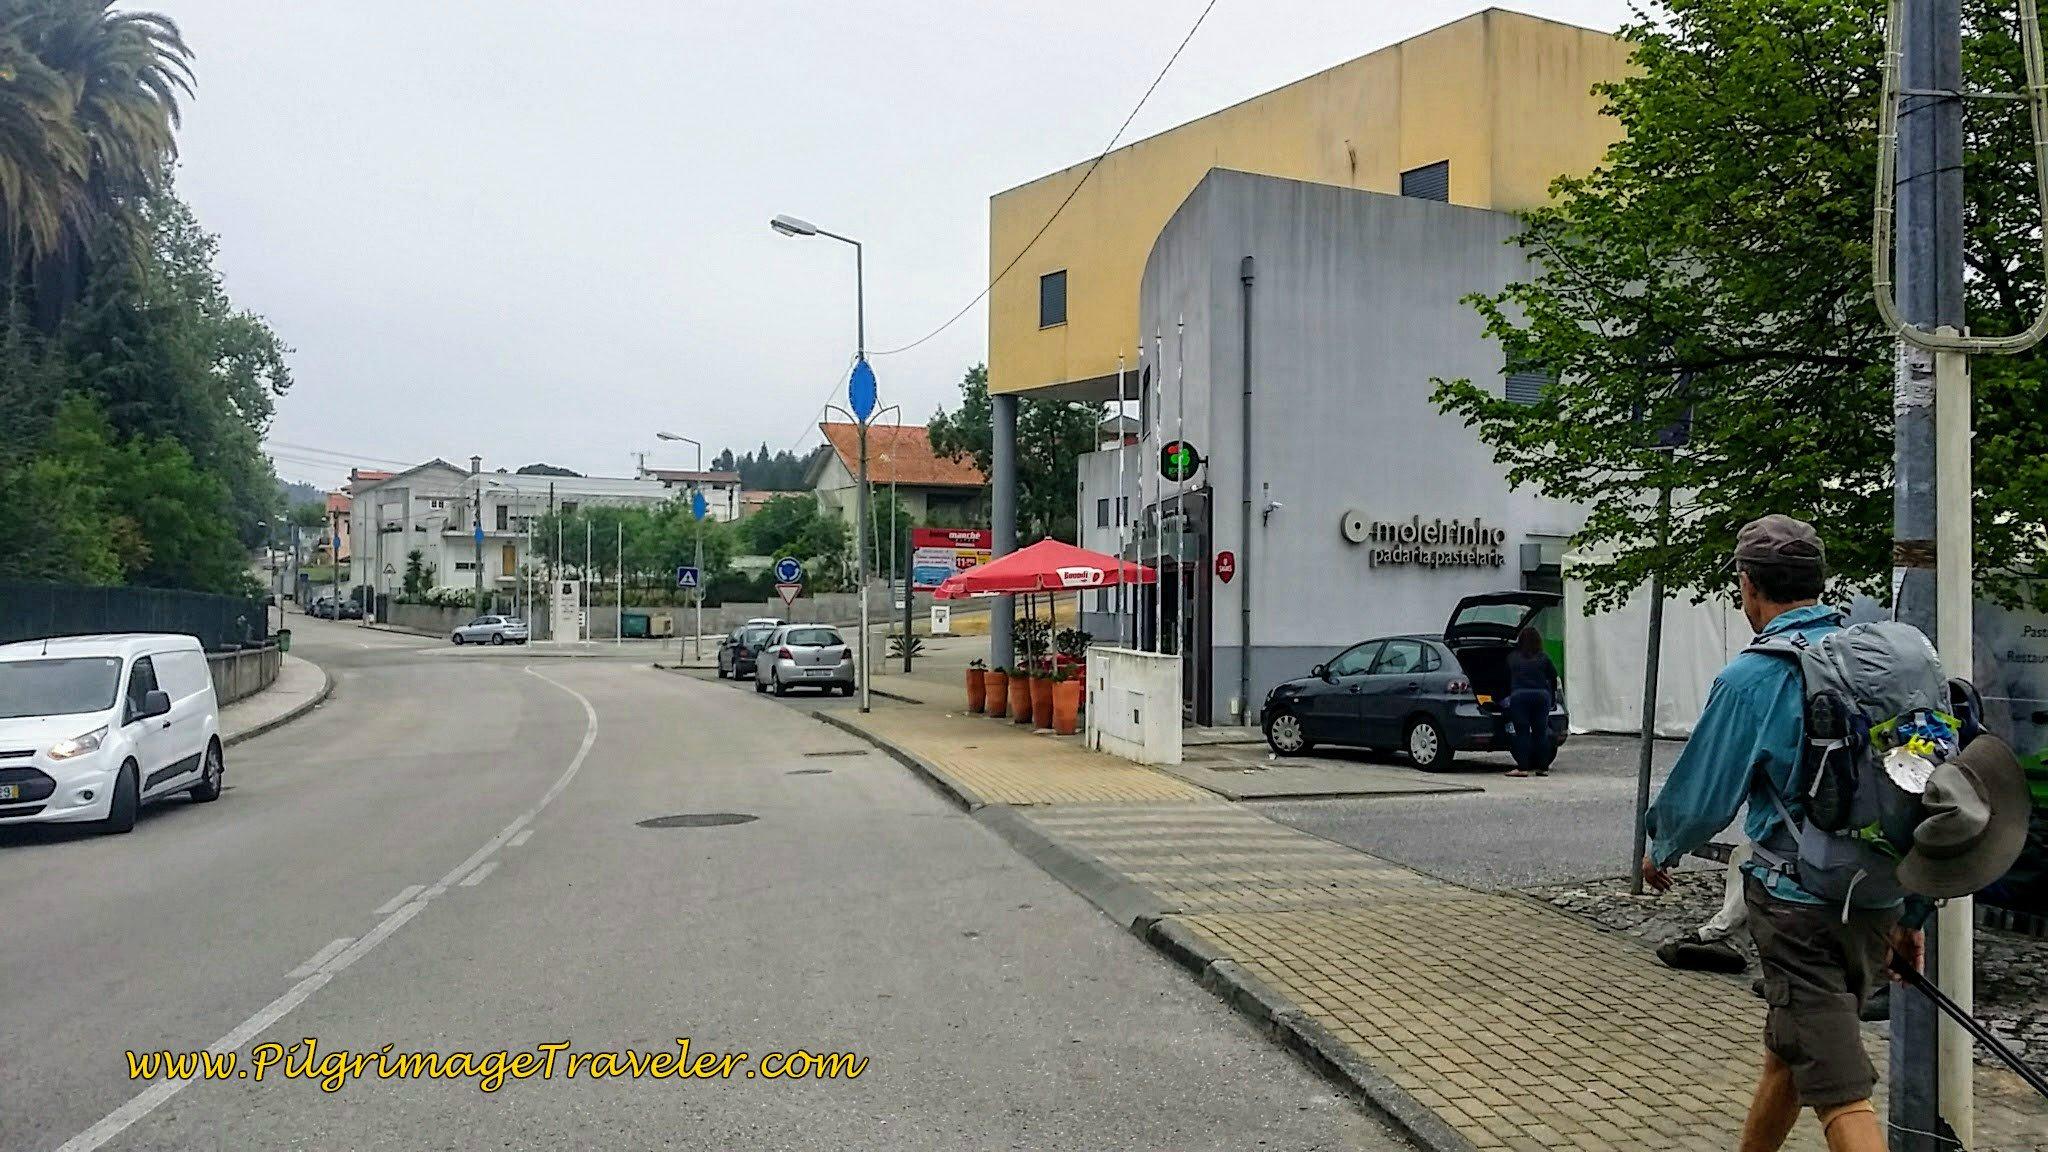 Telltale Café Umbrellas on the Rua Mesura in Cernache